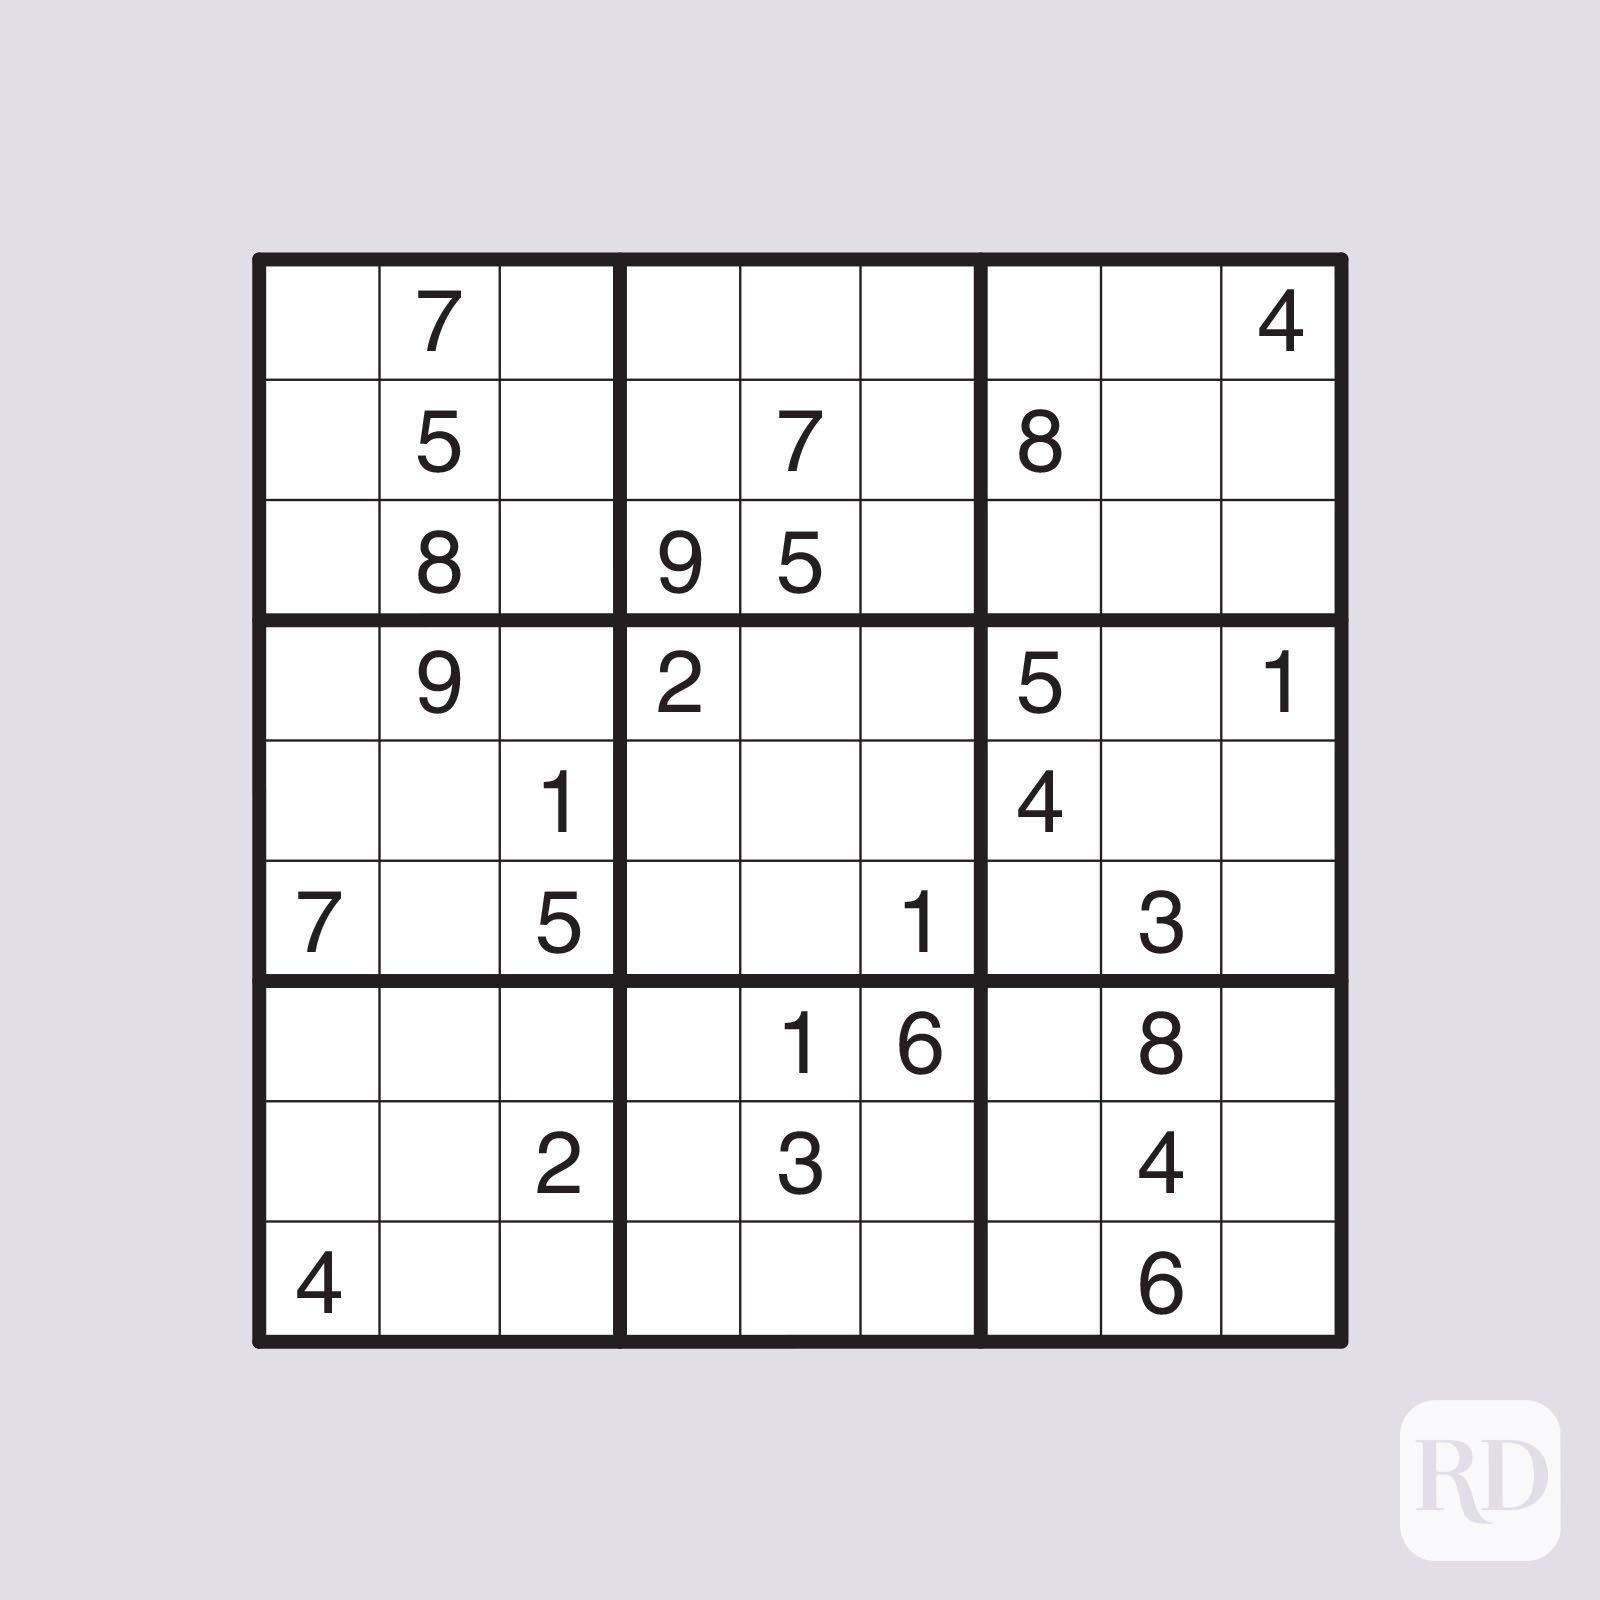 Very hard sudoku puzzle